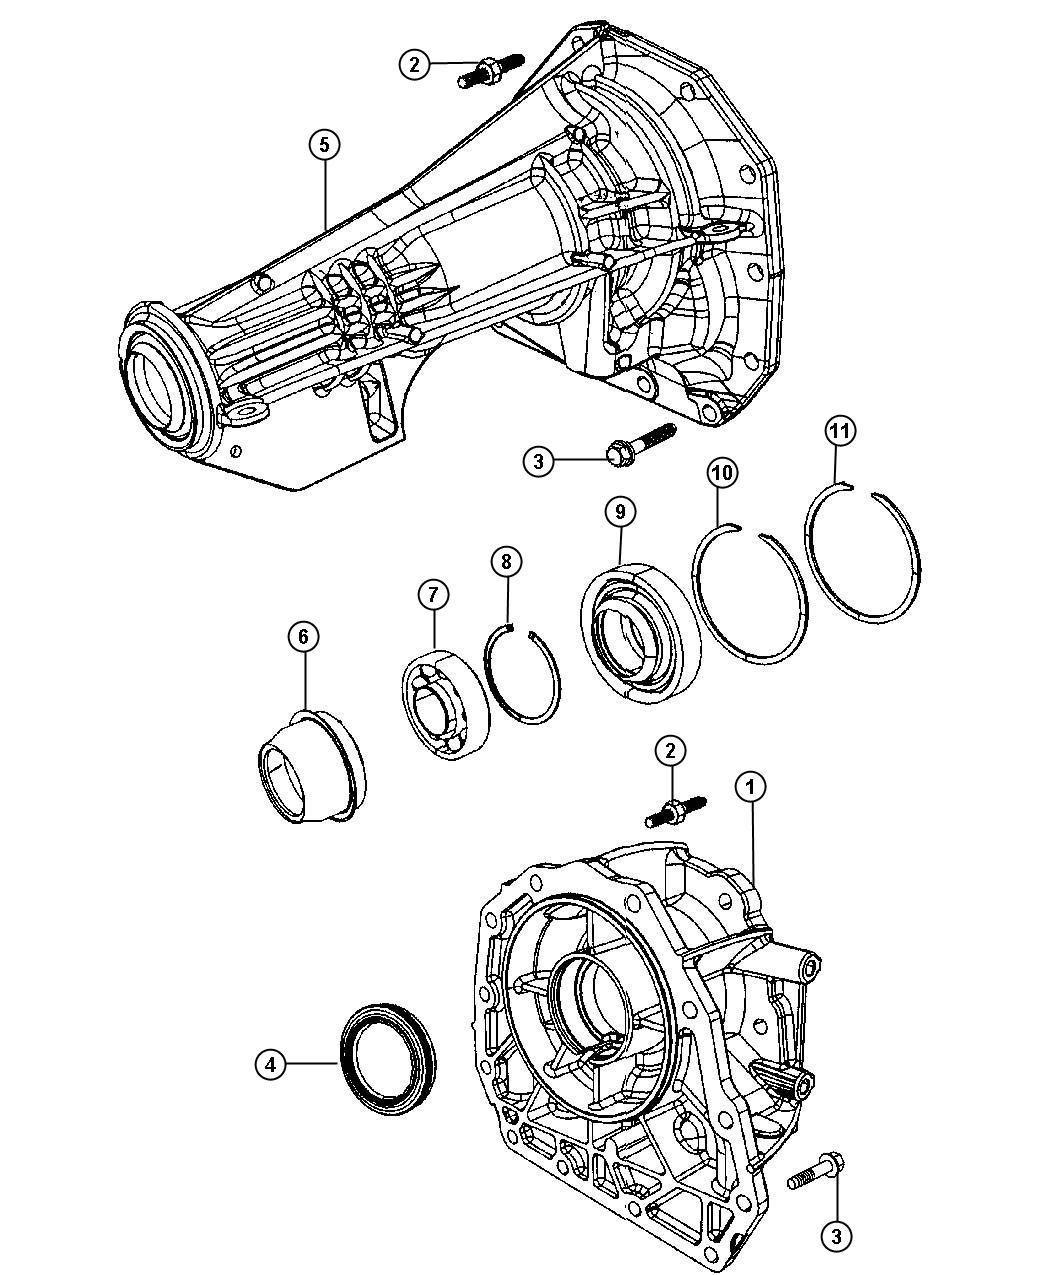 2000 dodge durango housing  transmission rear extension  axle  output  shaft